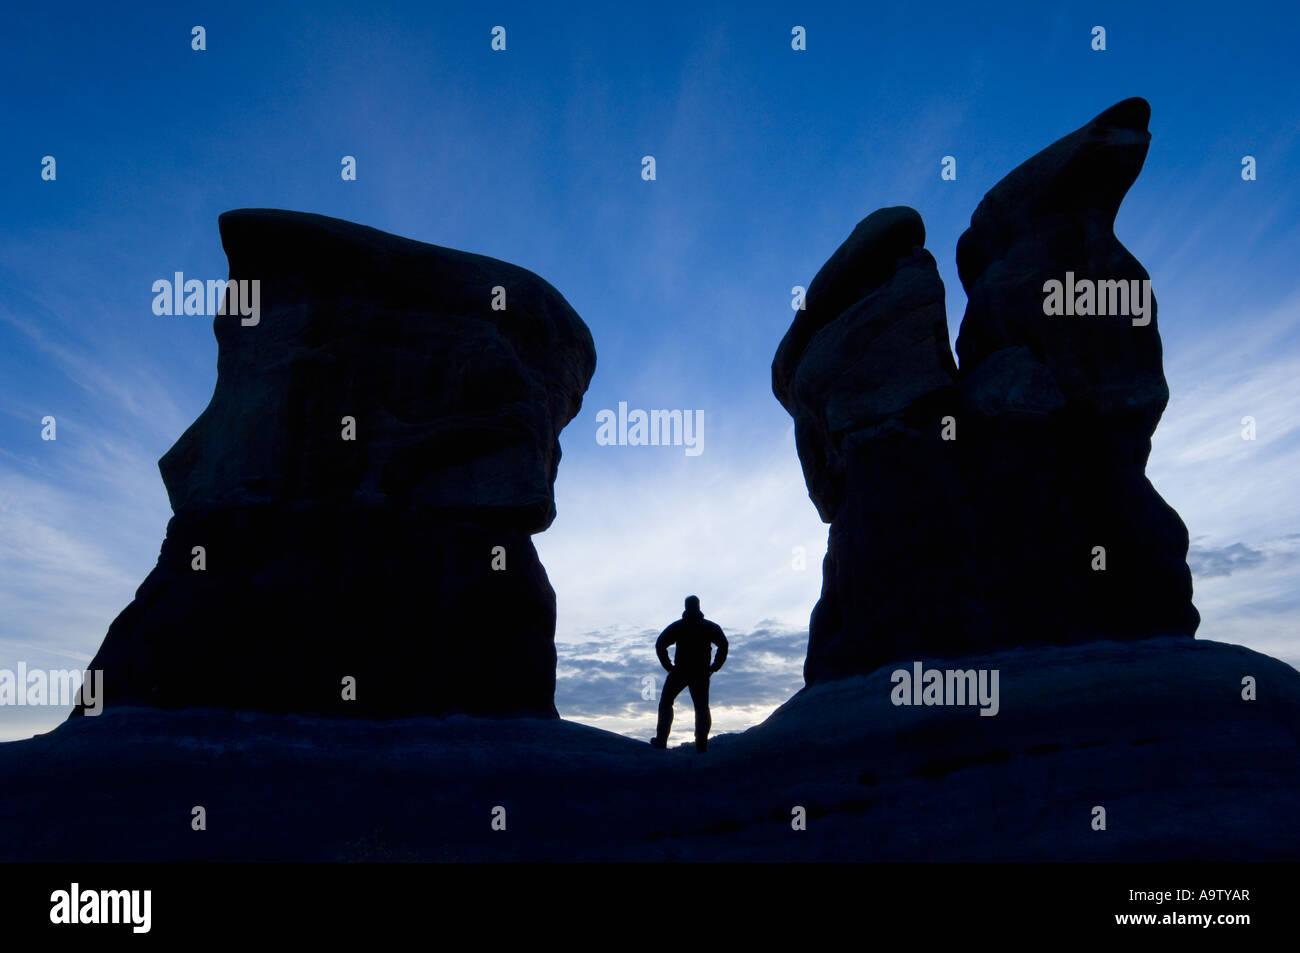 Hombre de pie entre dos características de arenisca en jardín DevilÕs UtahMan interponiéndose entre dos características de arenisca en Devil's Garden Foto de stock